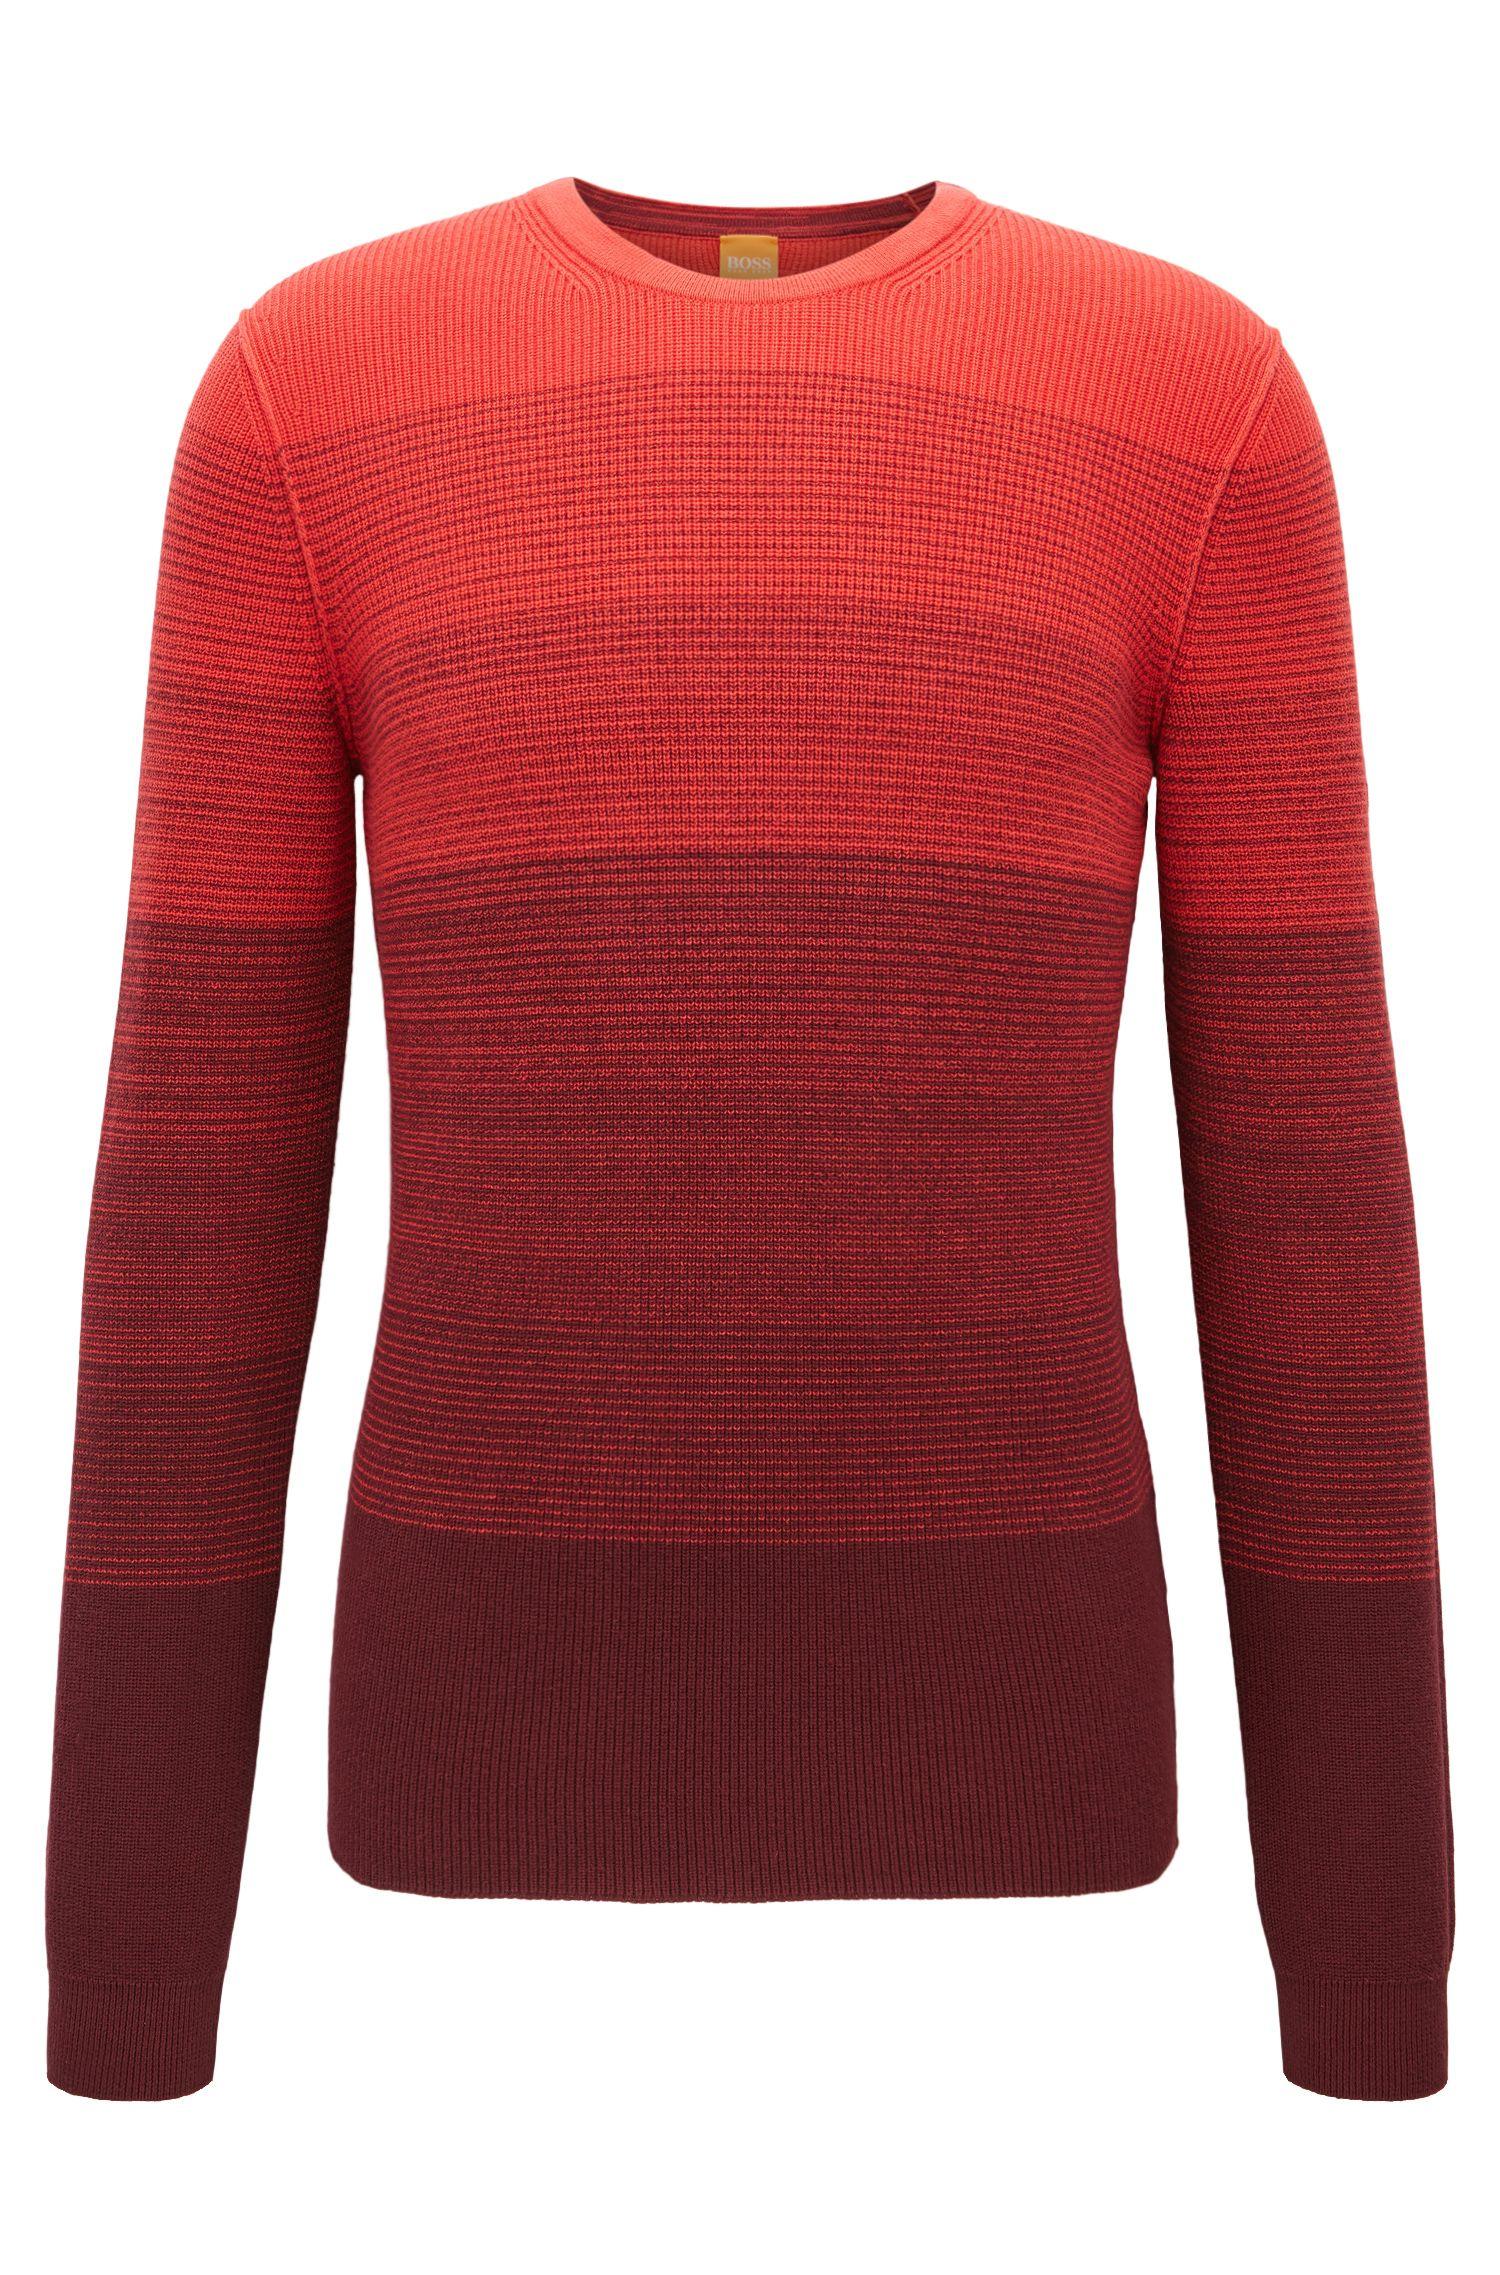 Katoenen trui met dégradé ribbeltextuur